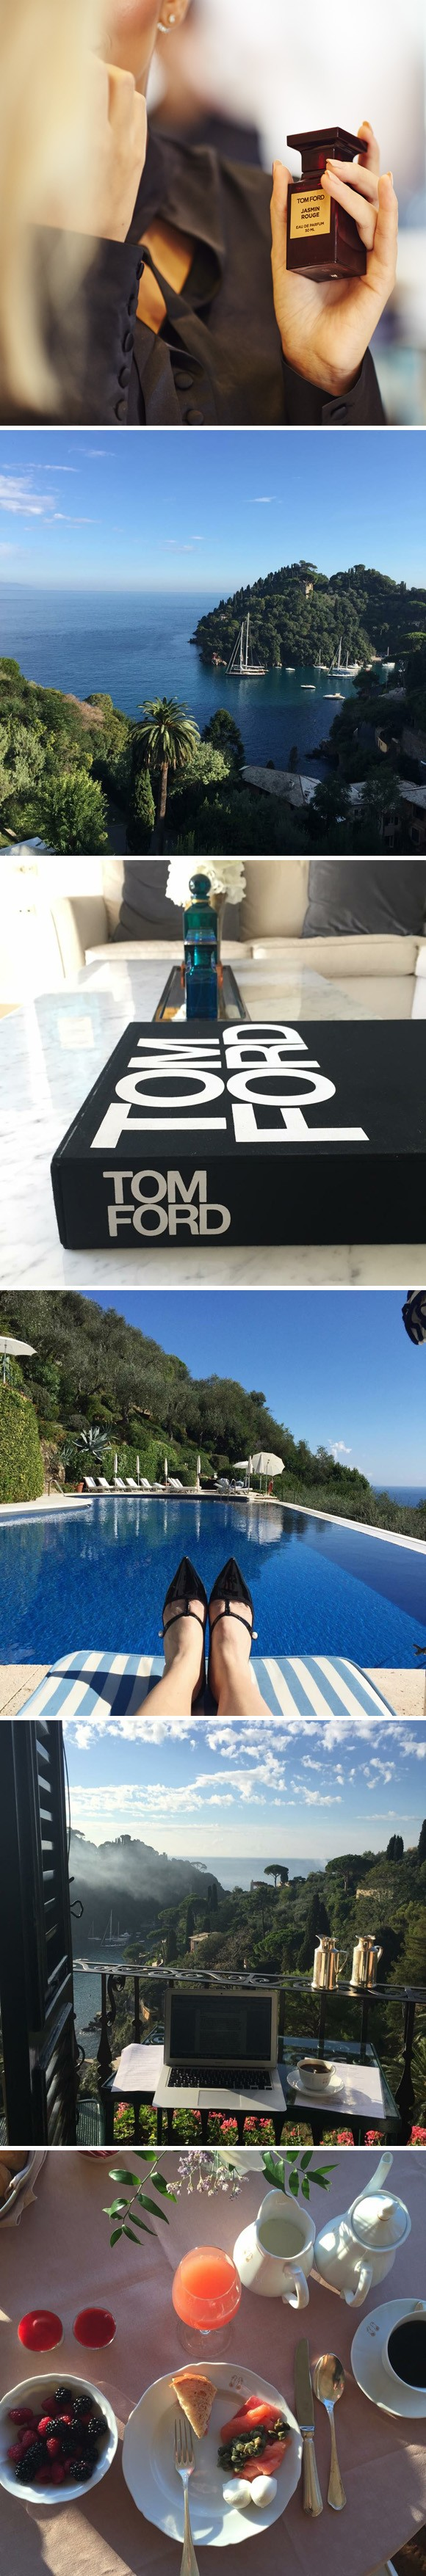 TomFordTur